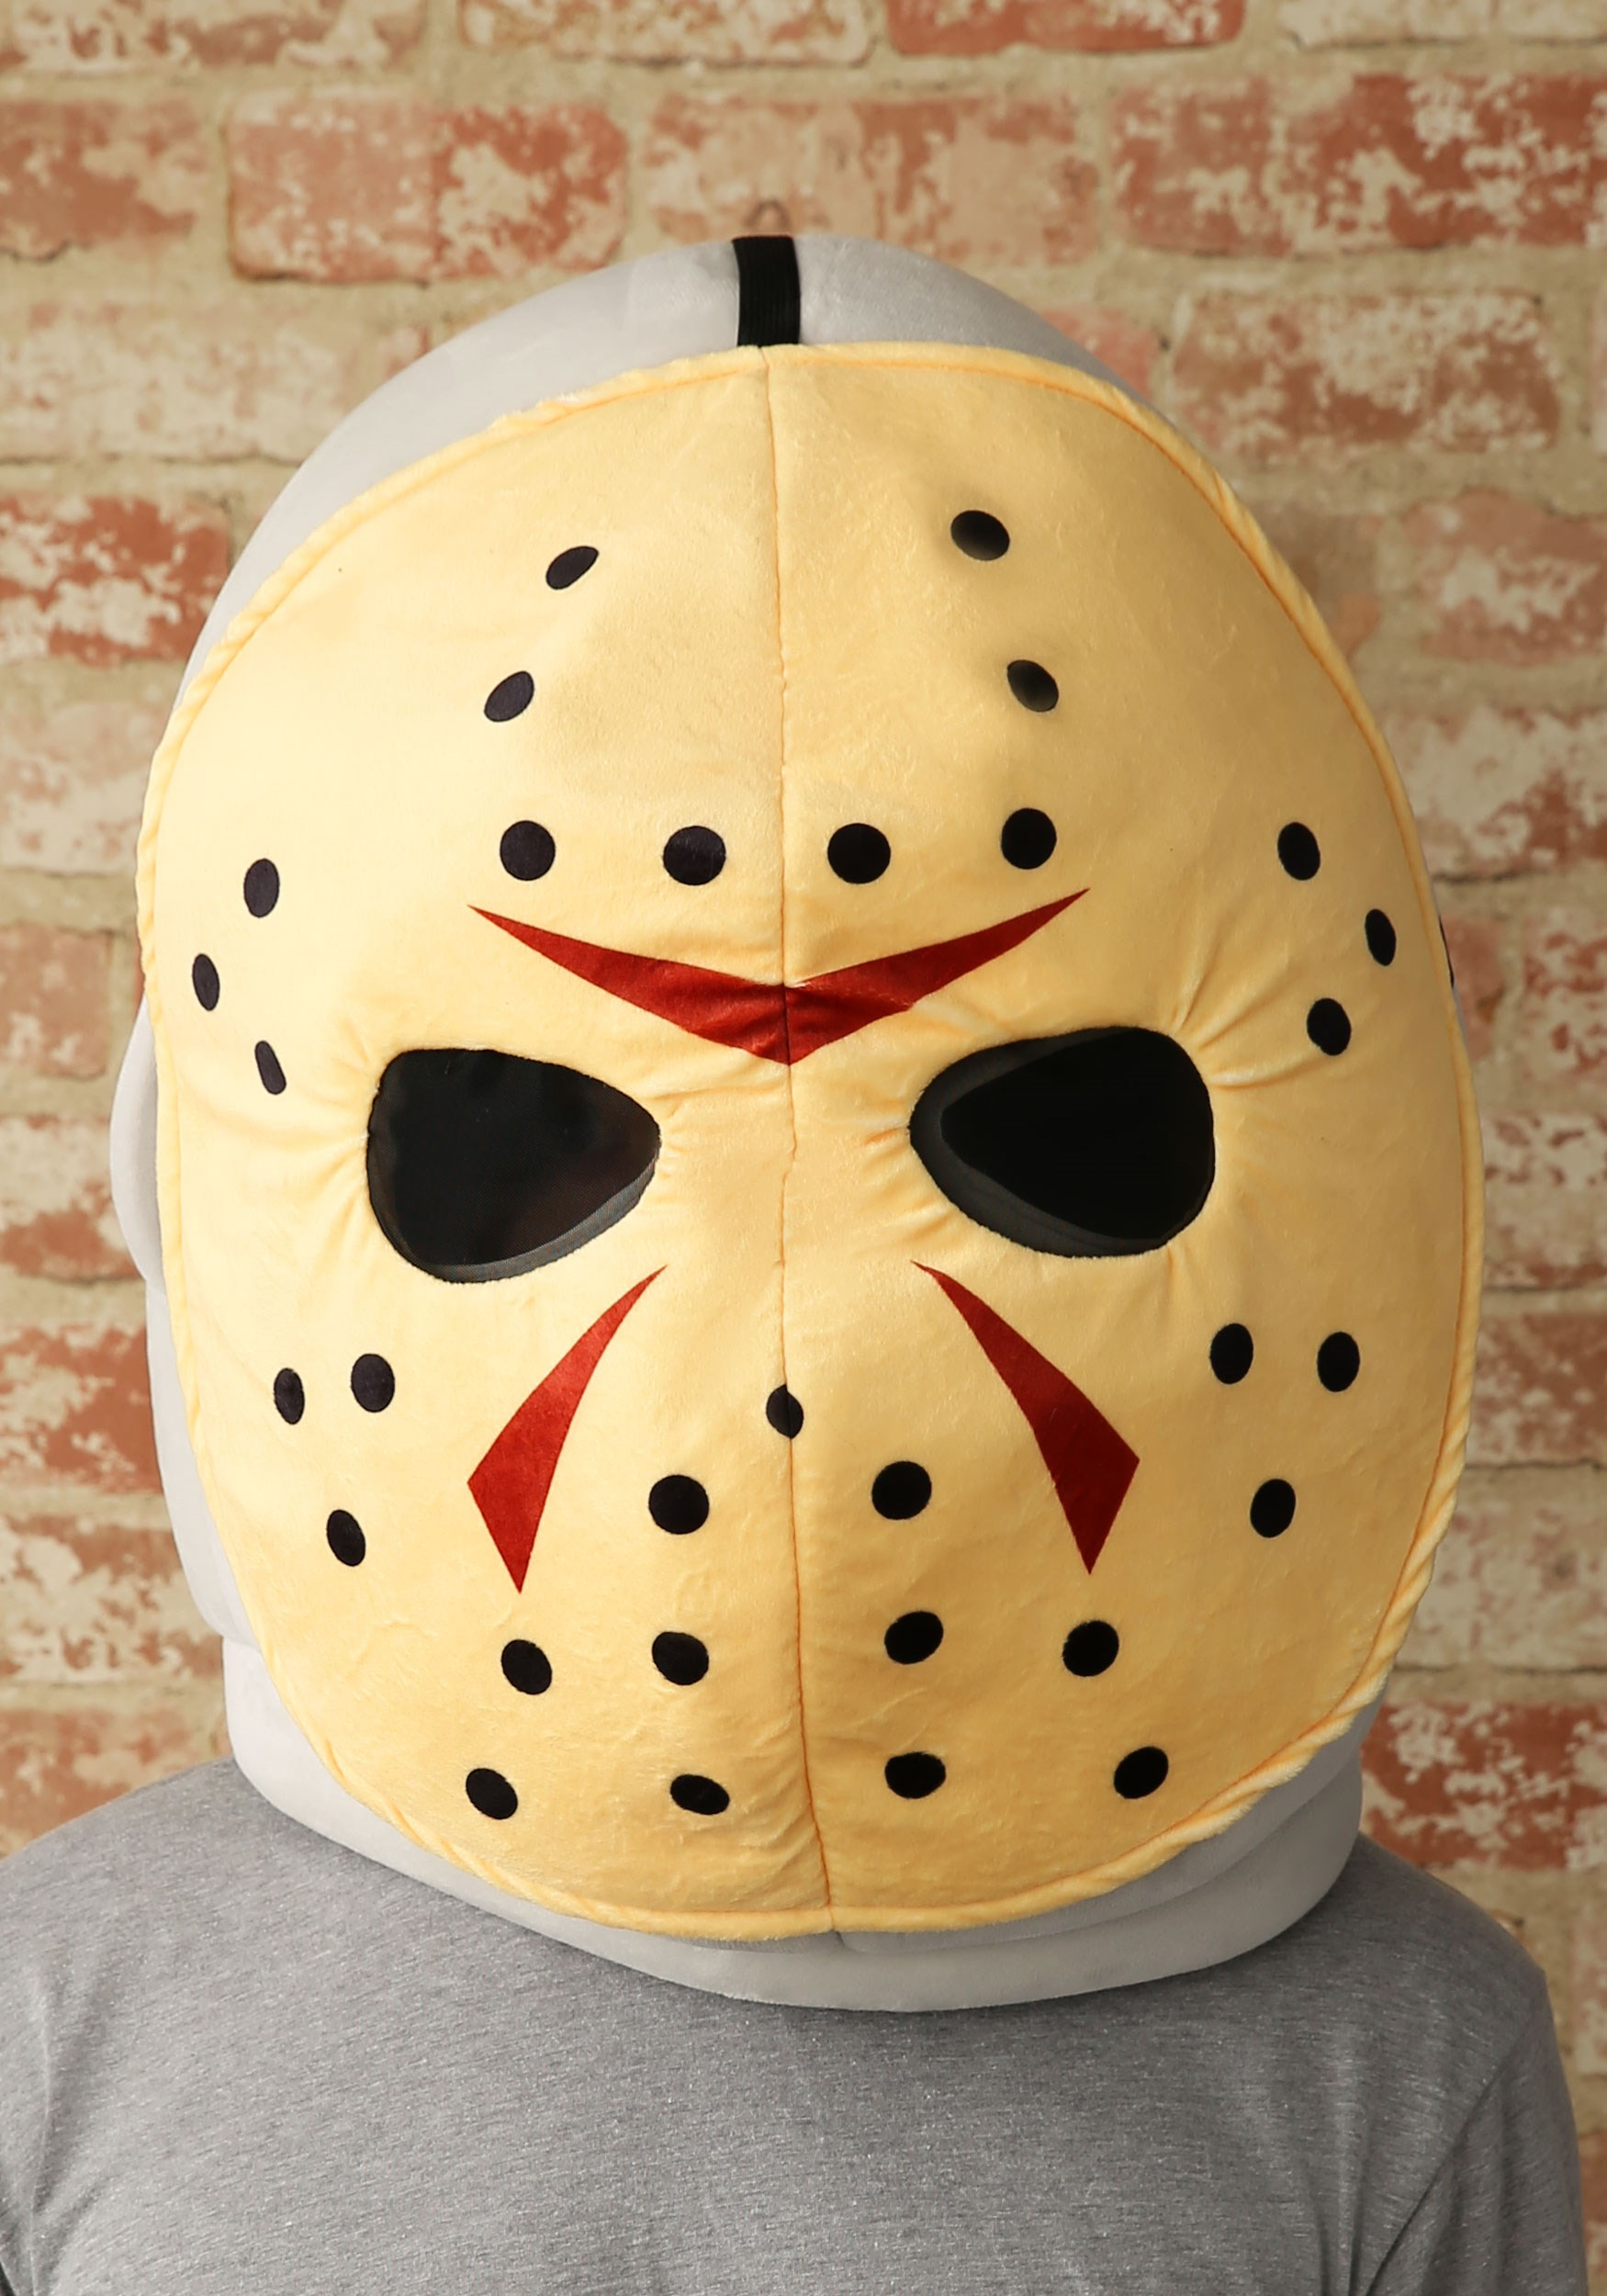 2x Halloween Mask Jason Voorhees Friday the 13th Horror Movie Hockey Mask AU